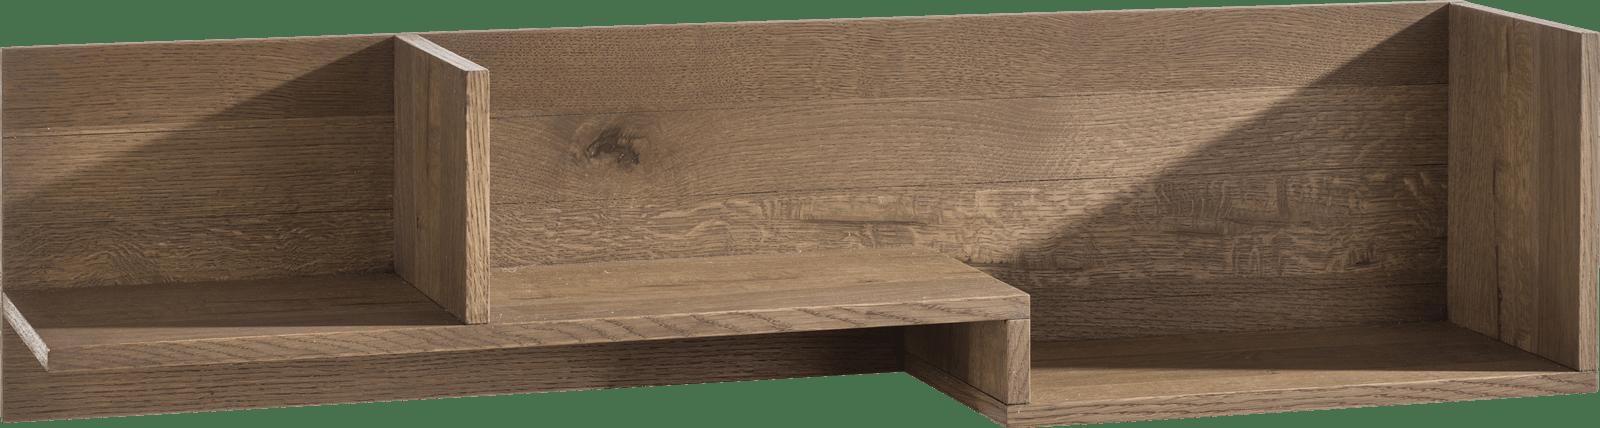 Henders & Hazel - Santorini - Natuerlich - wandregal 120 cm